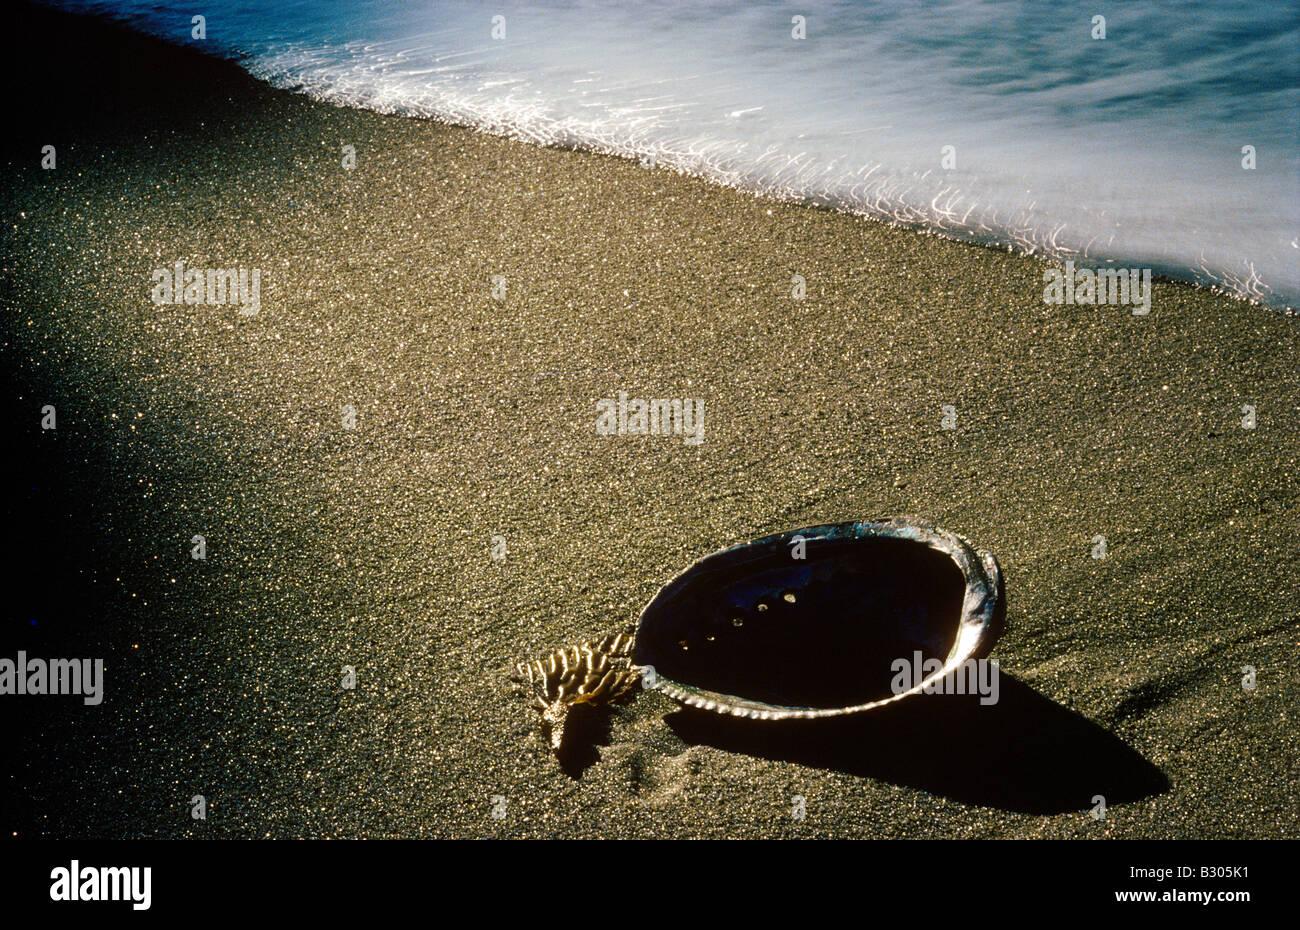 Abalone shell Haliotis iris with passing wave on sandy shore - Stock Image